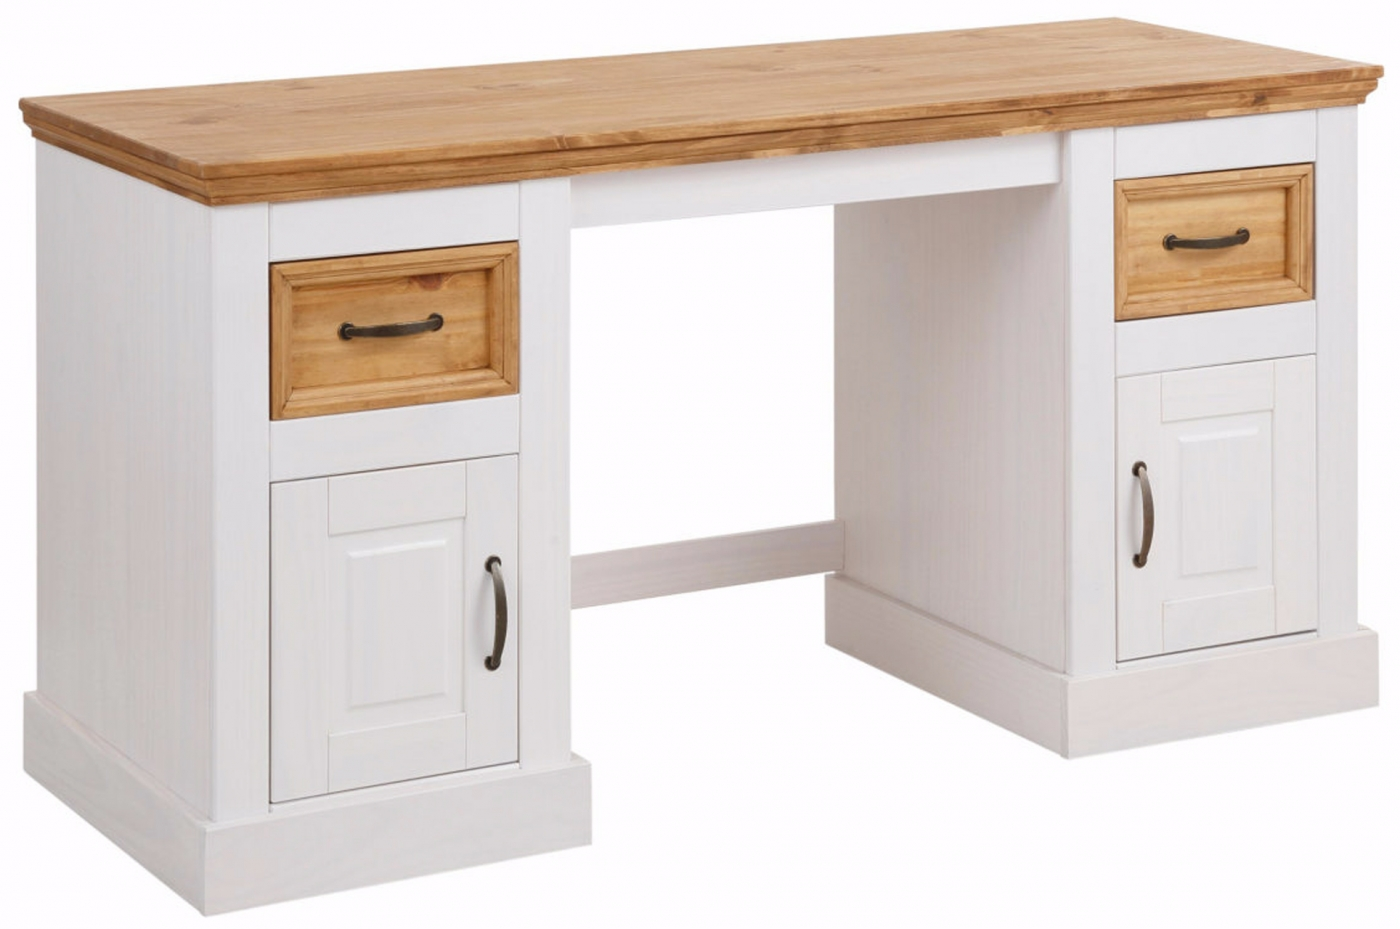 Pracovní stůl Yvet, 150 cm, bílá